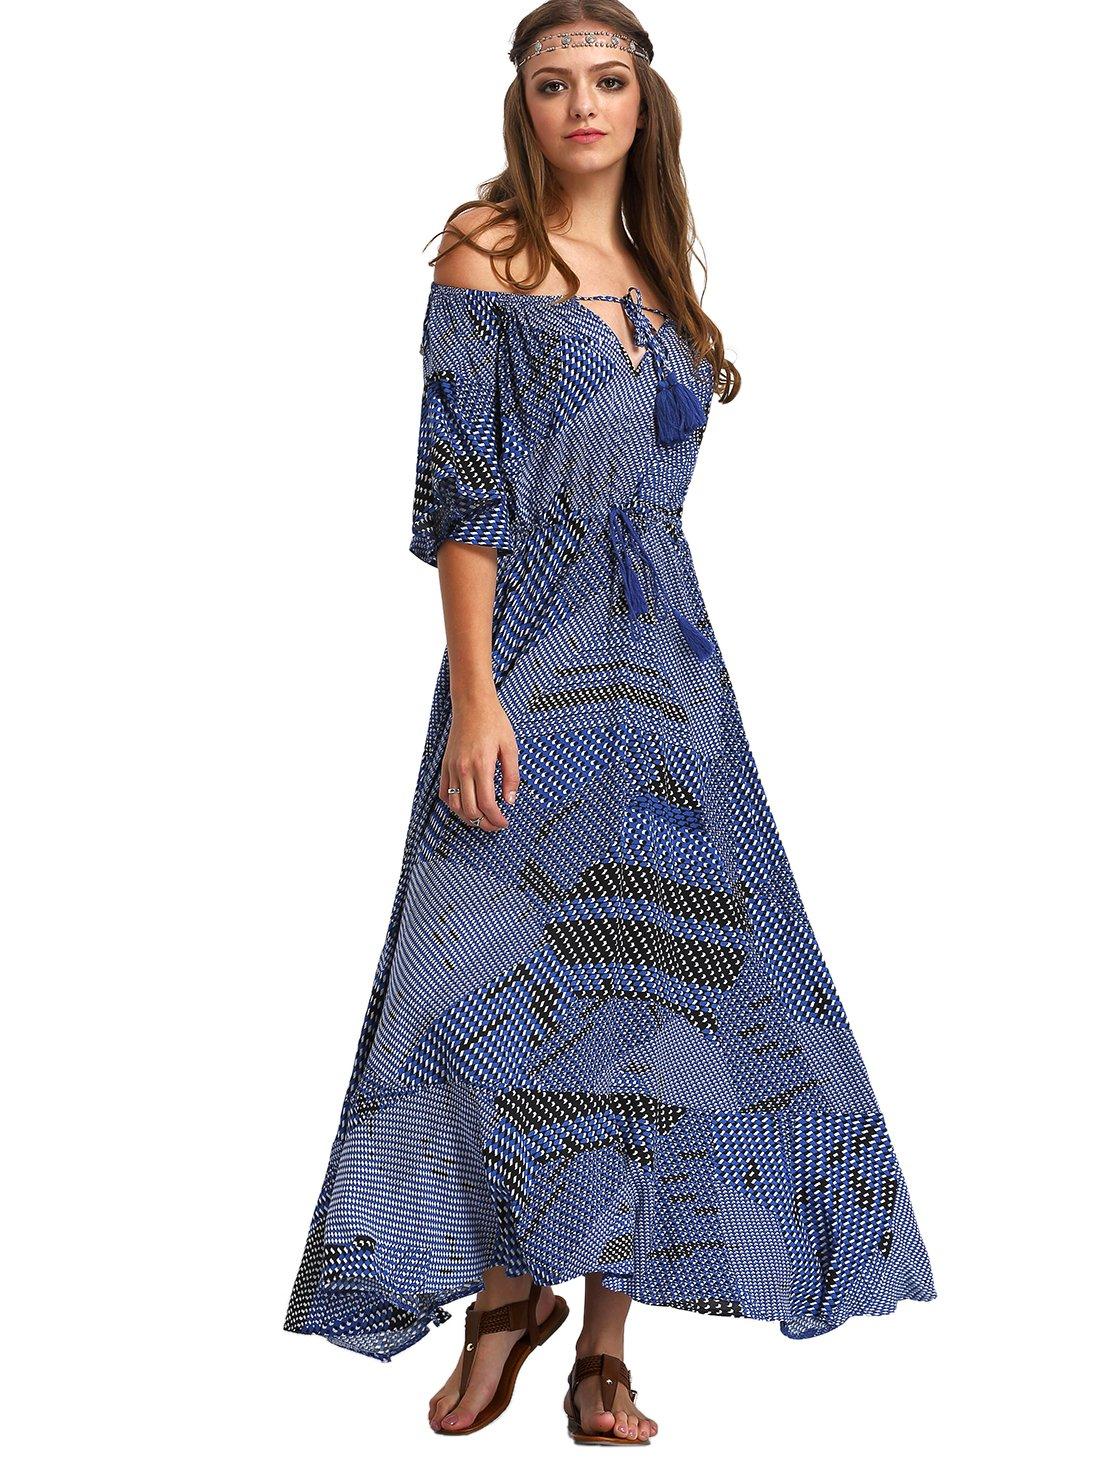 Milumia Women s Boho Off The Shoulder Swing Maxi Dress   Casual ... 33779291b